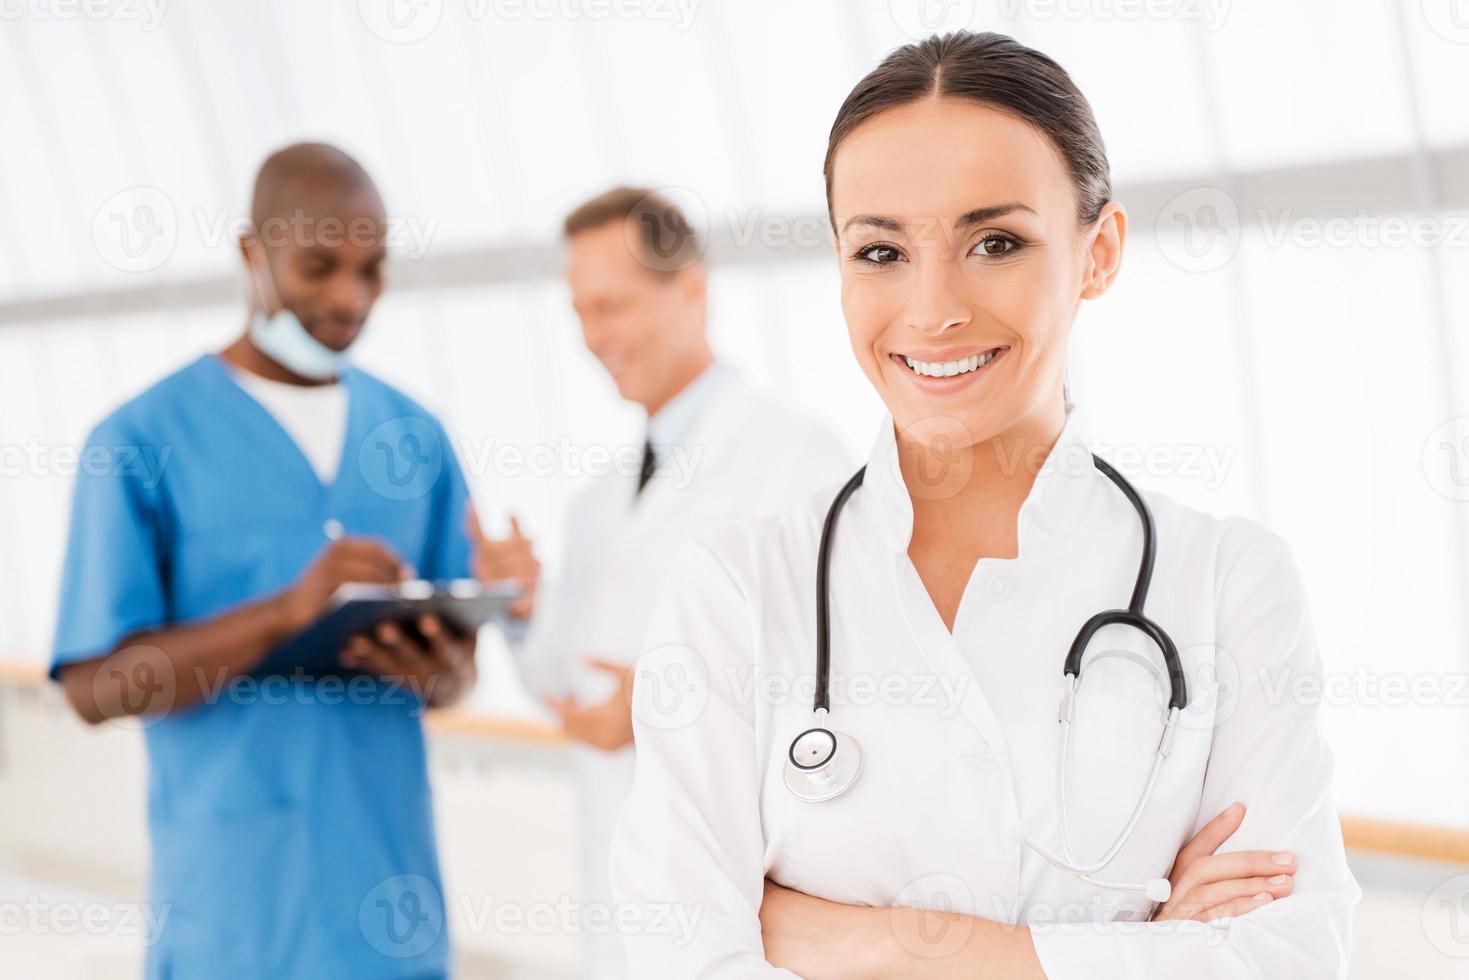 selbstbewusste Ärztin. foto